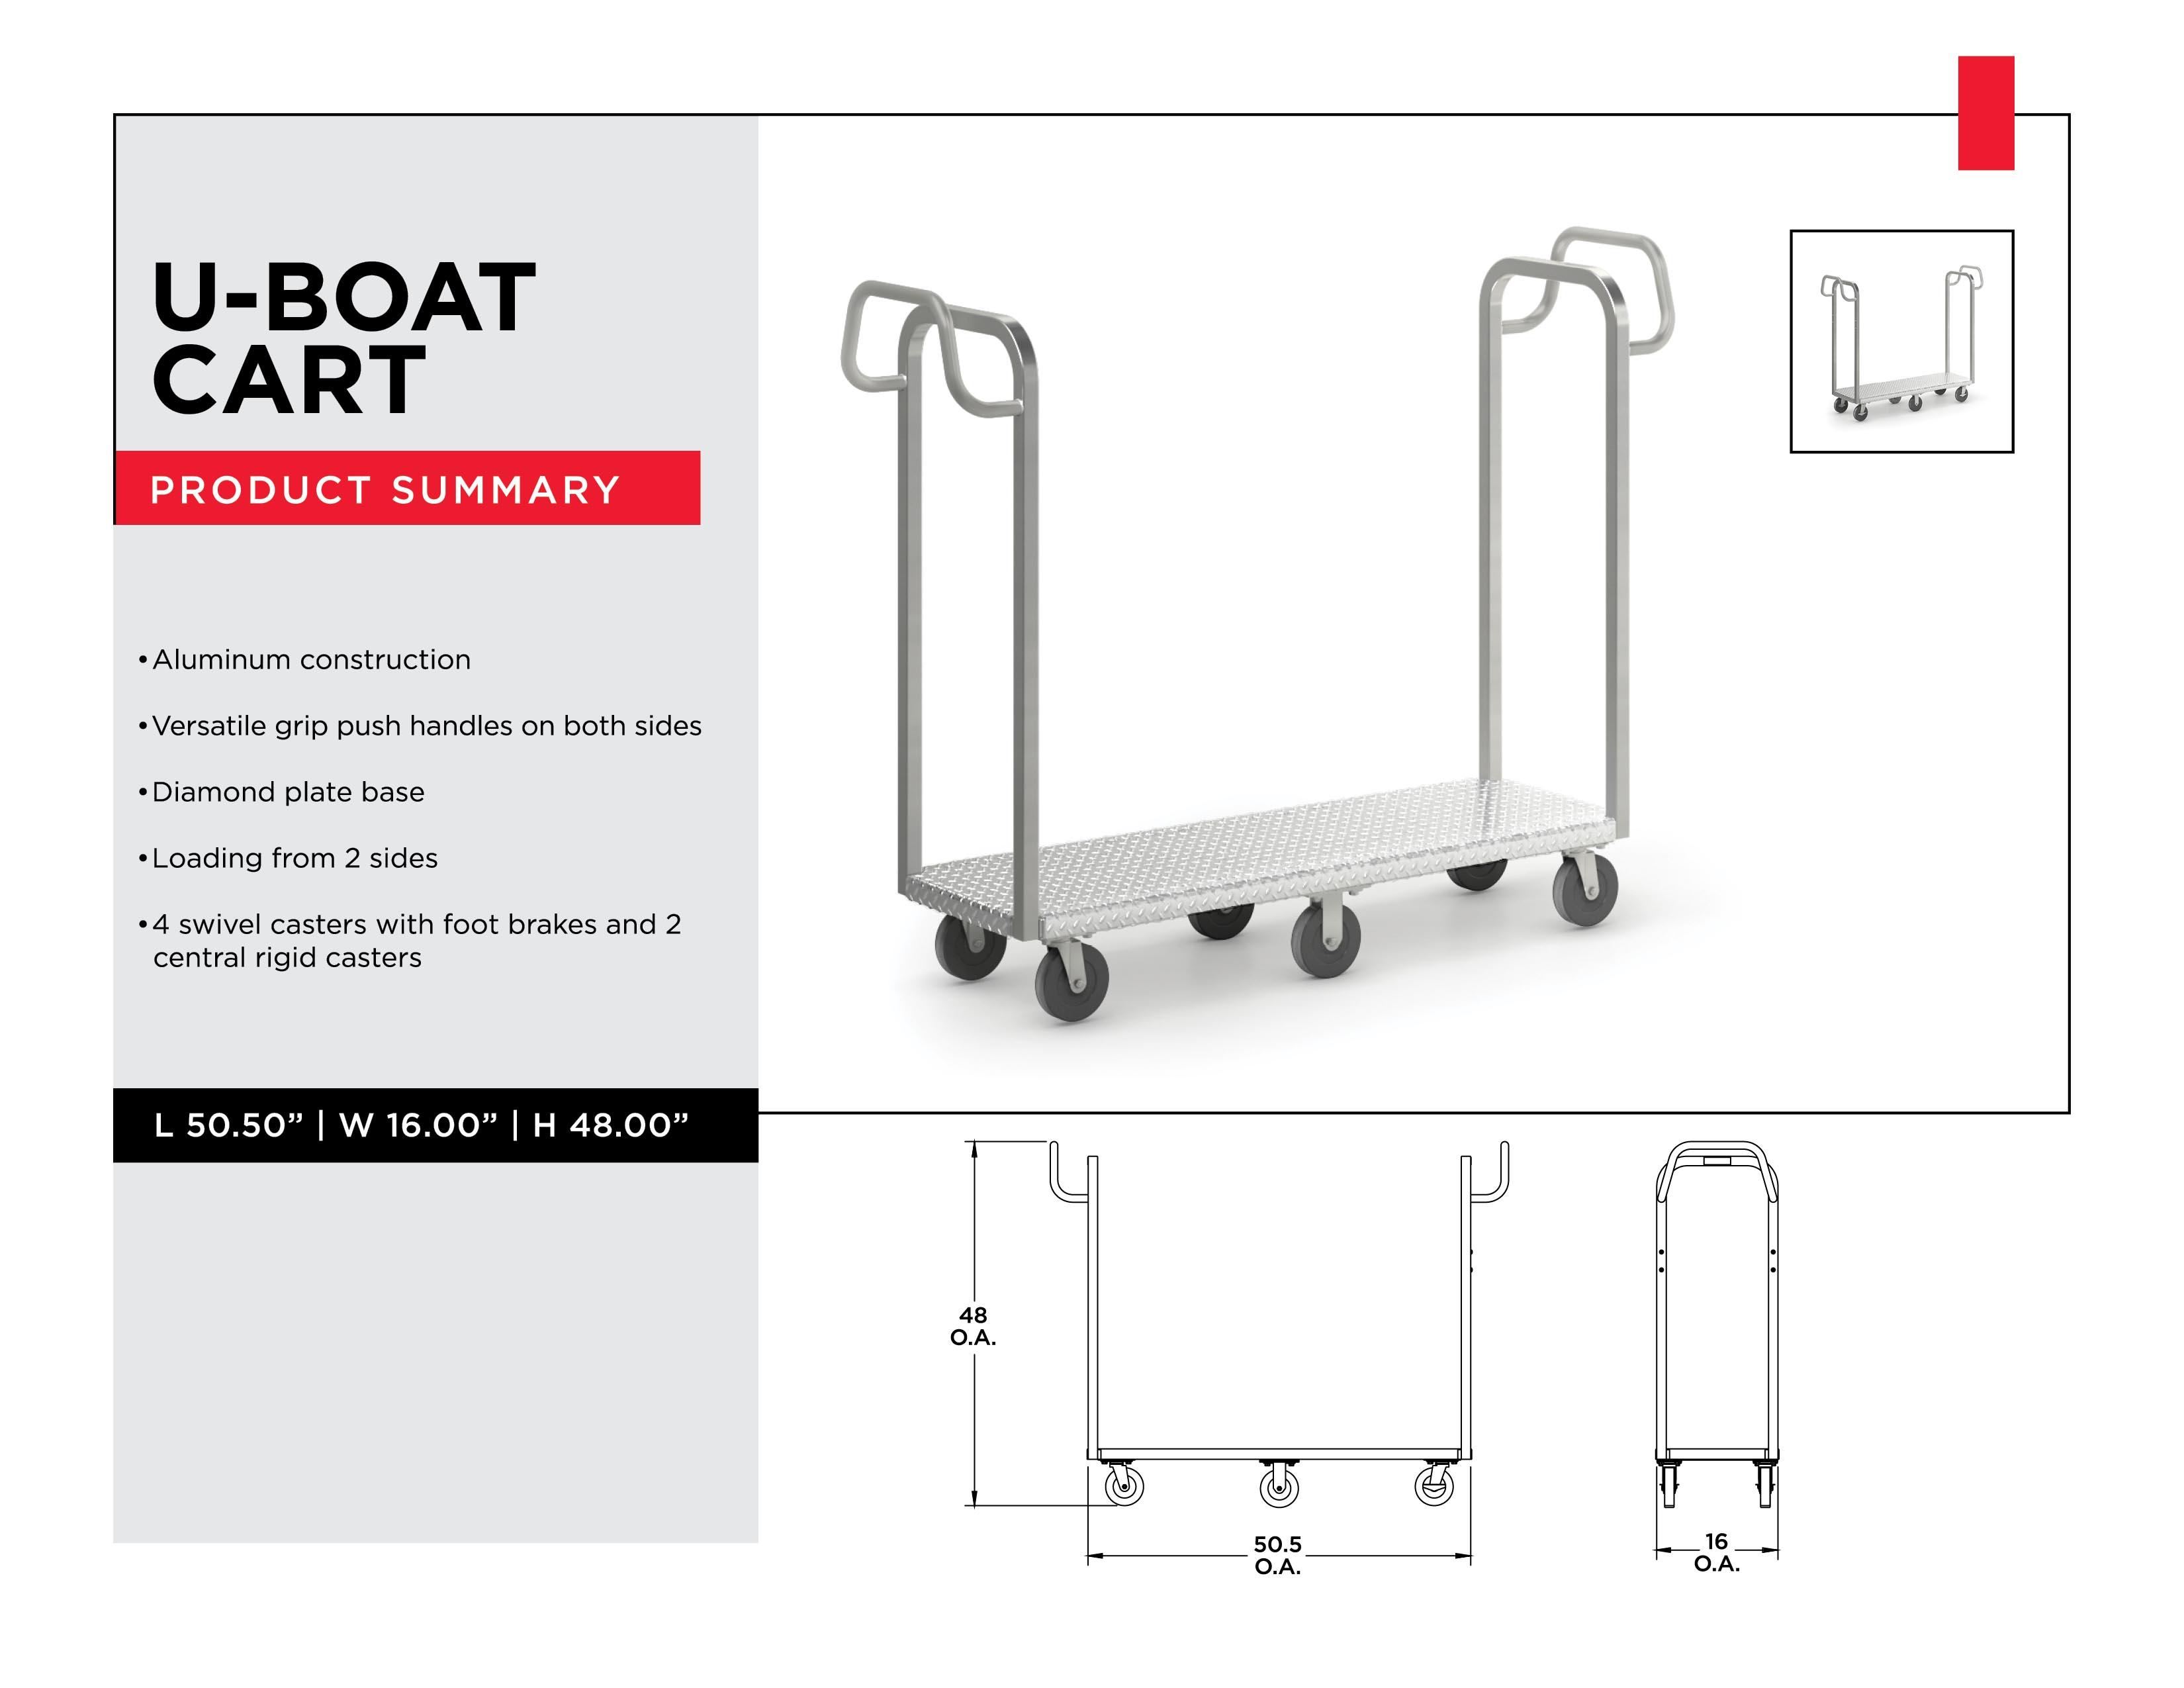 Retail Inventory Management: U-Boat Cart